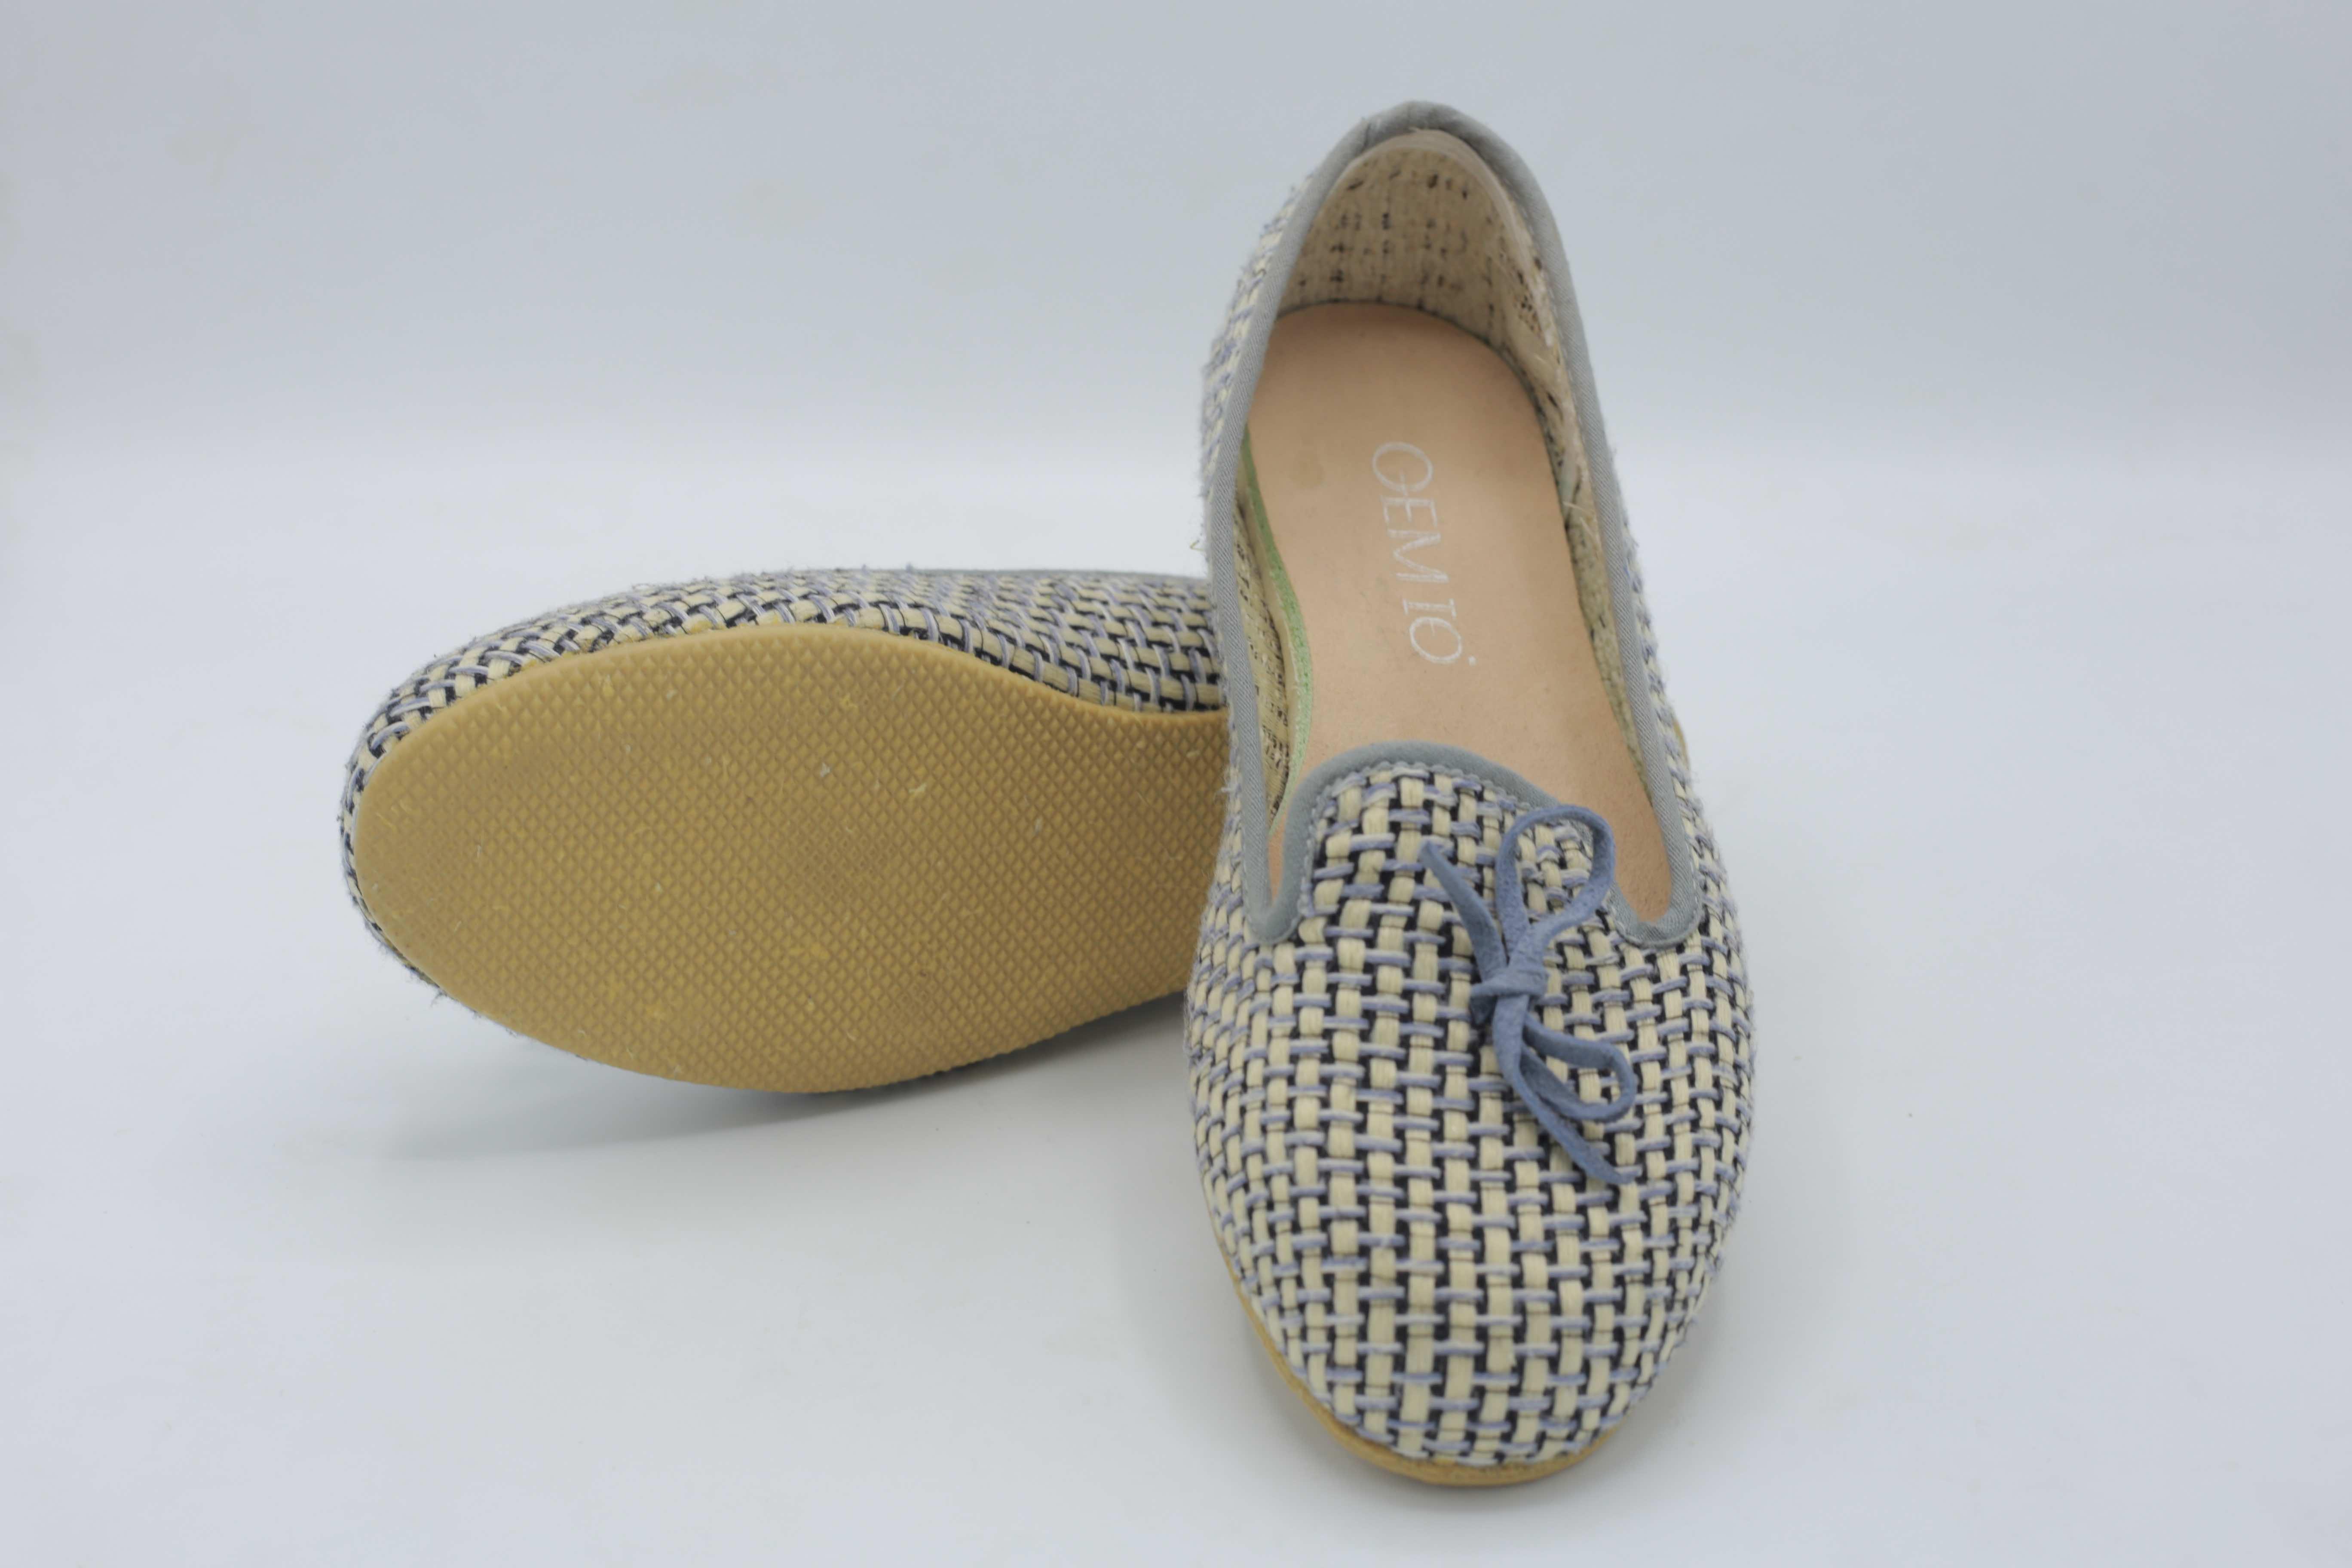 C04012 รองเท้าผ้าทอมือ Gemio